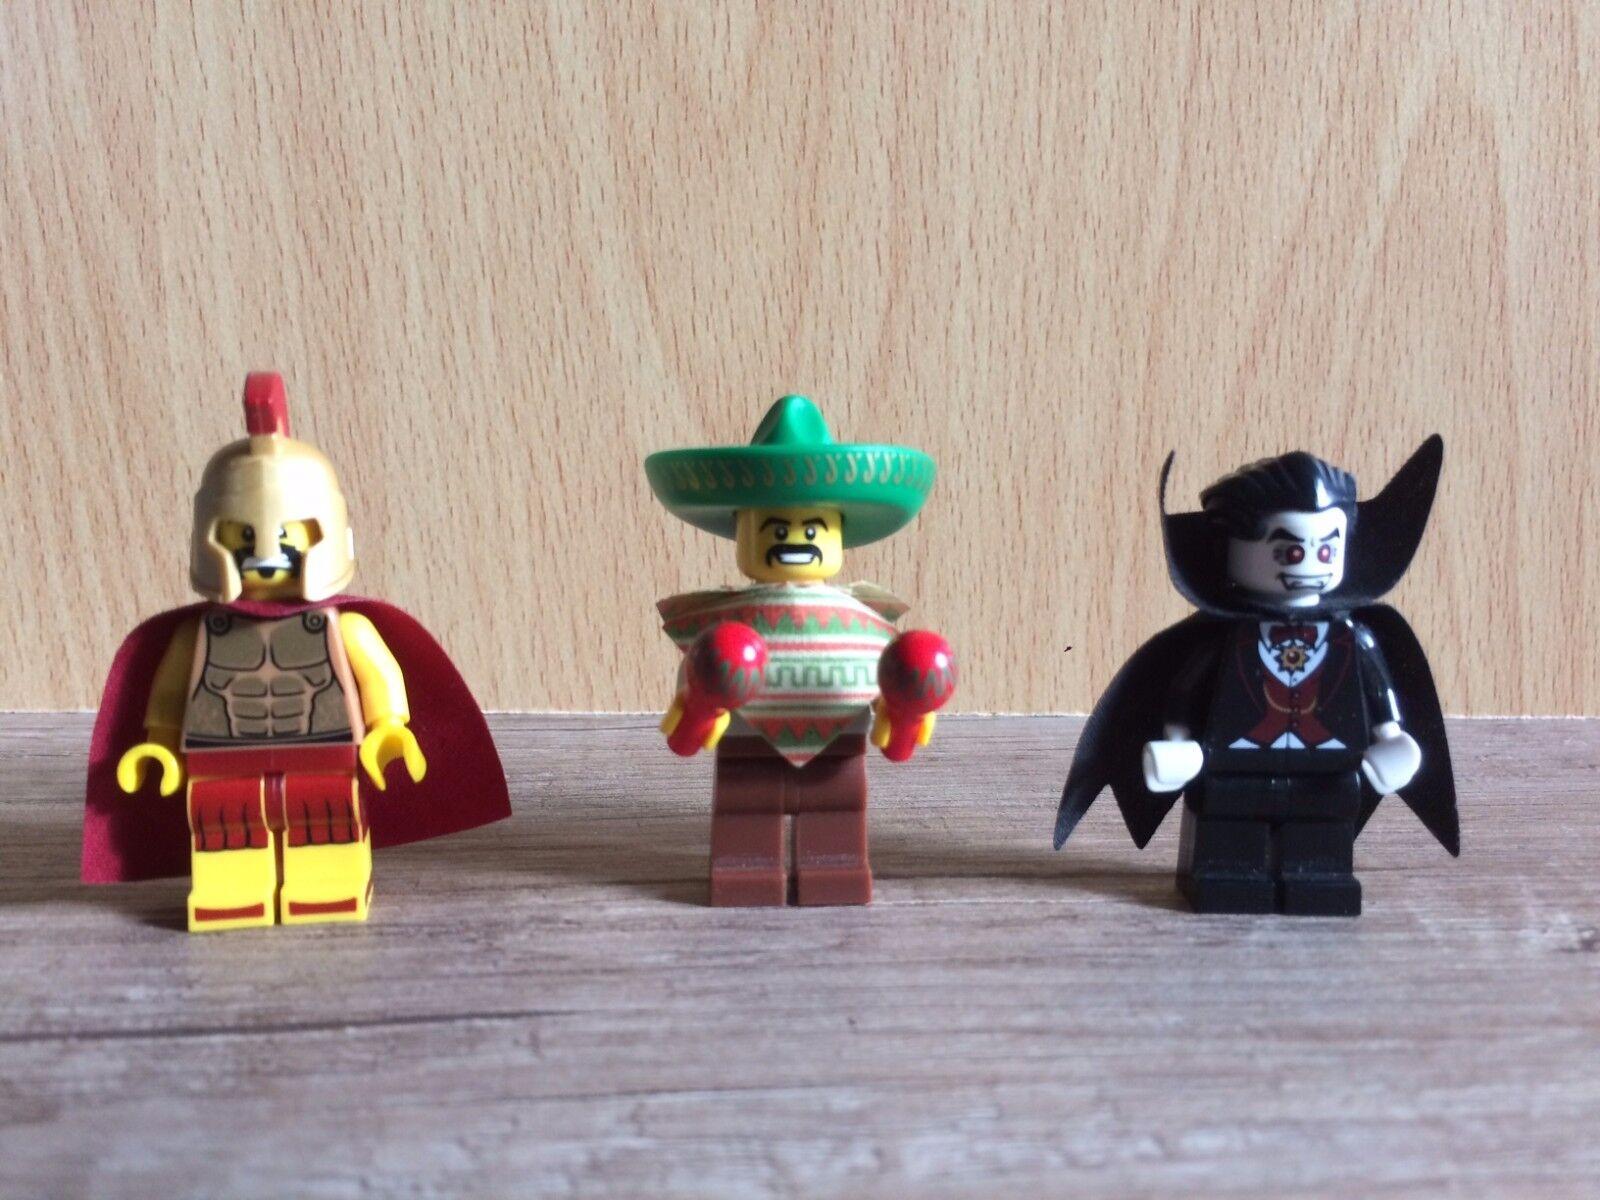 Lego 8684 Minifigur Vampir Mexikaner Spartaner Serie Figur 2